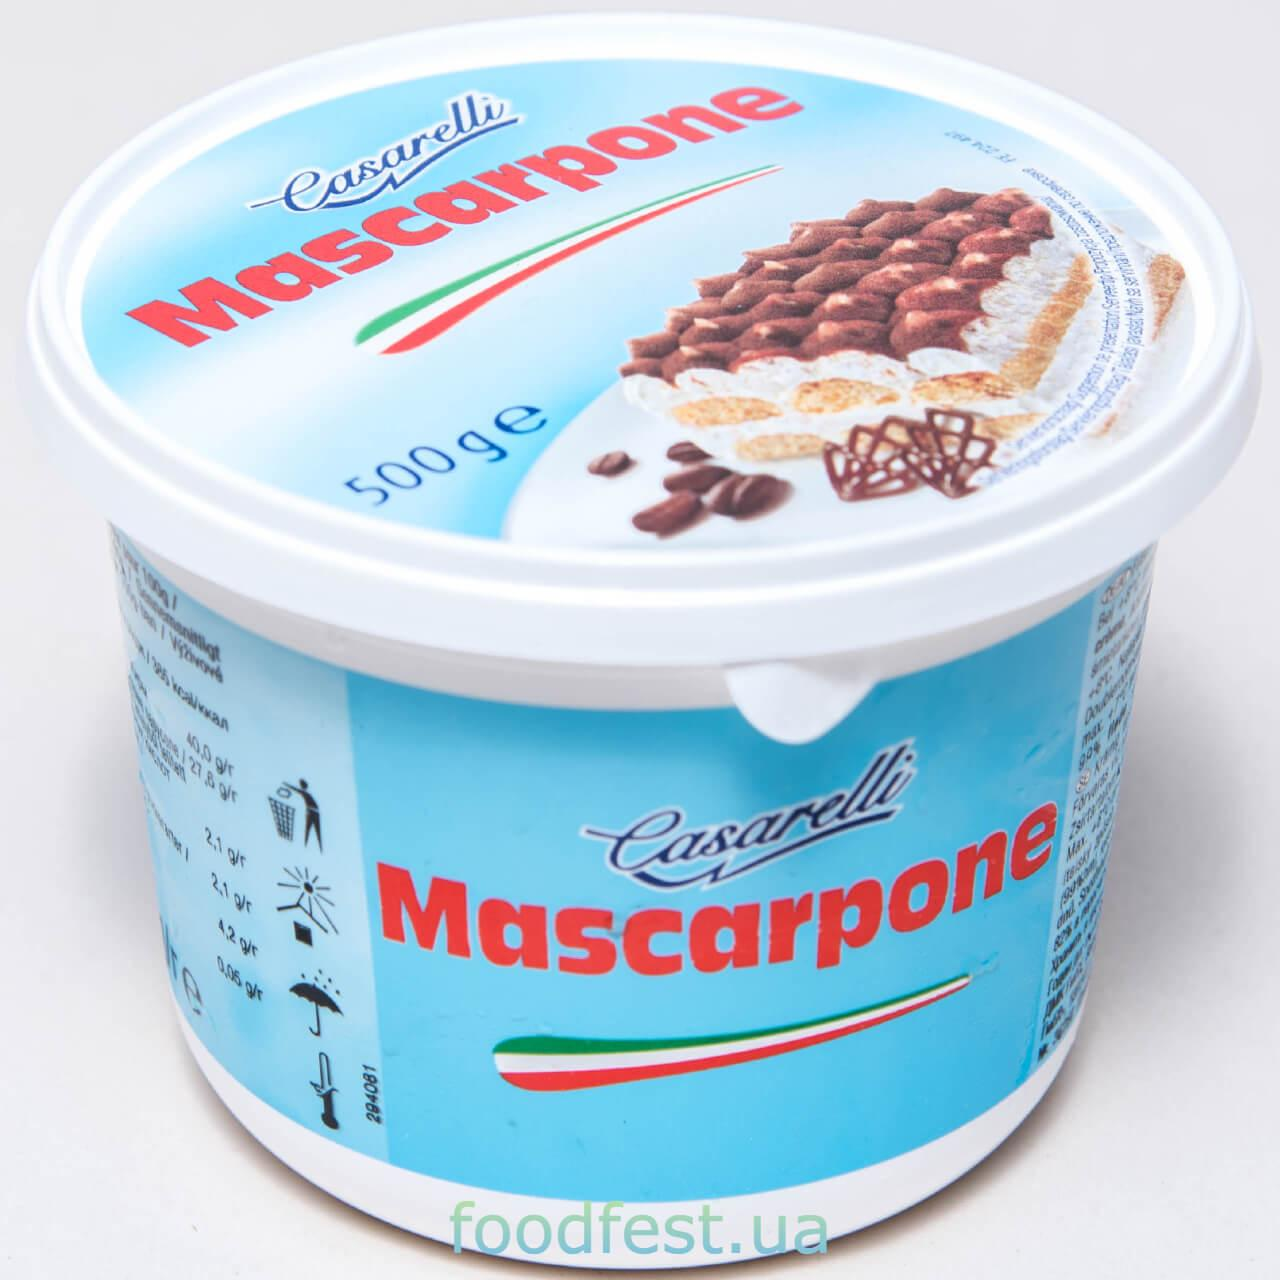 Сыр Маскарпоне TM Casarelli 500г